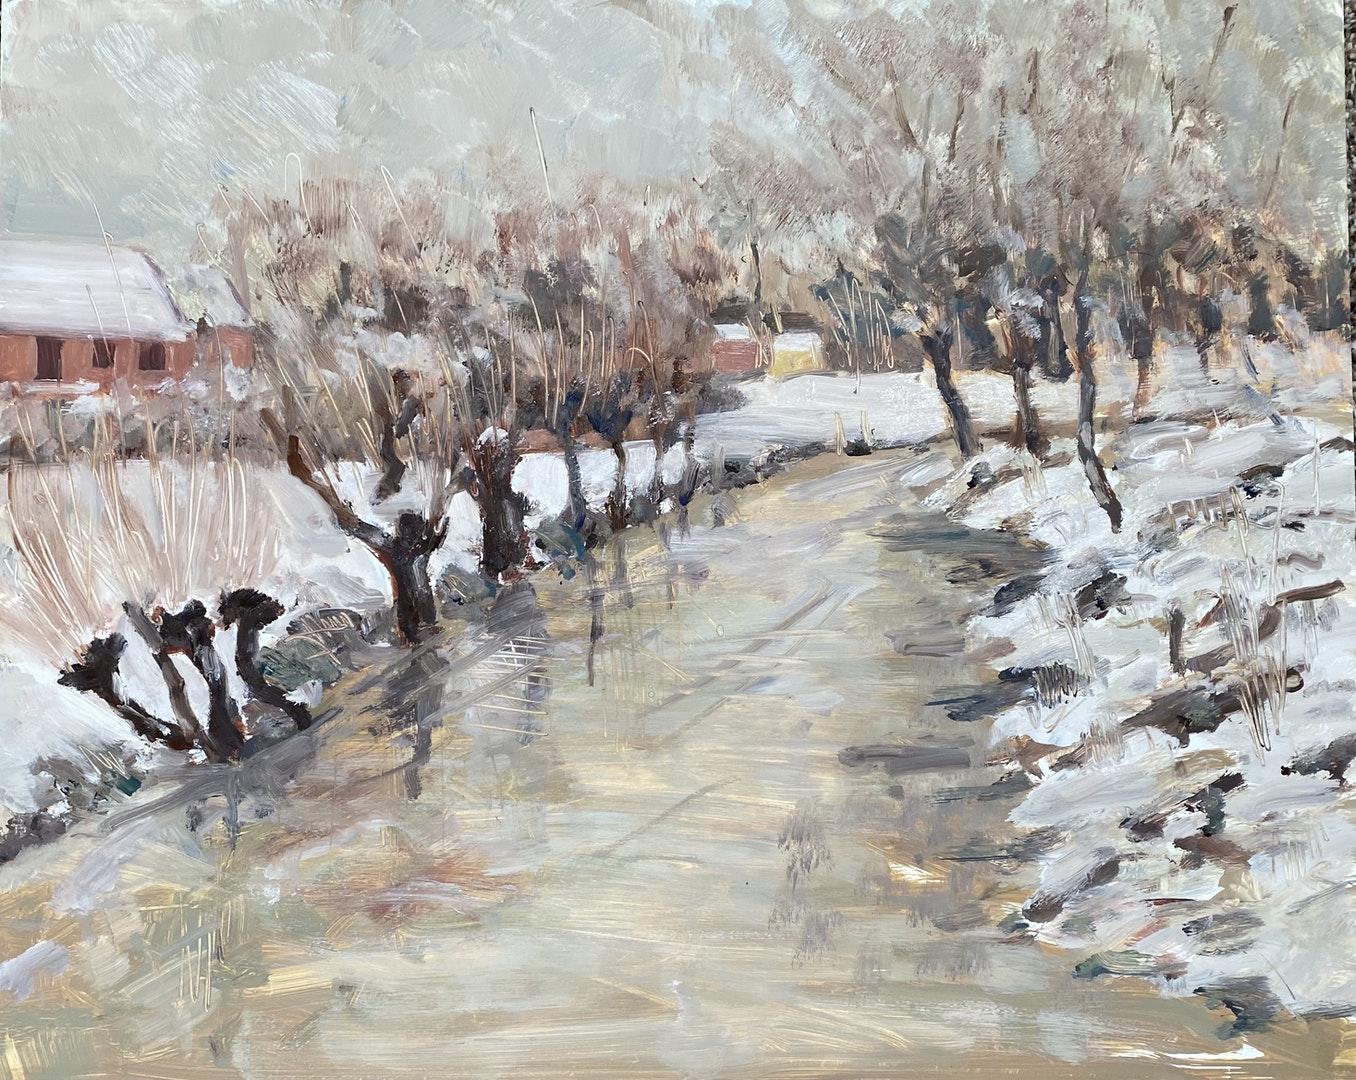 'Shelley Floods. Snow', Michael Crowe, Oil on panel, 40 x 50 cm